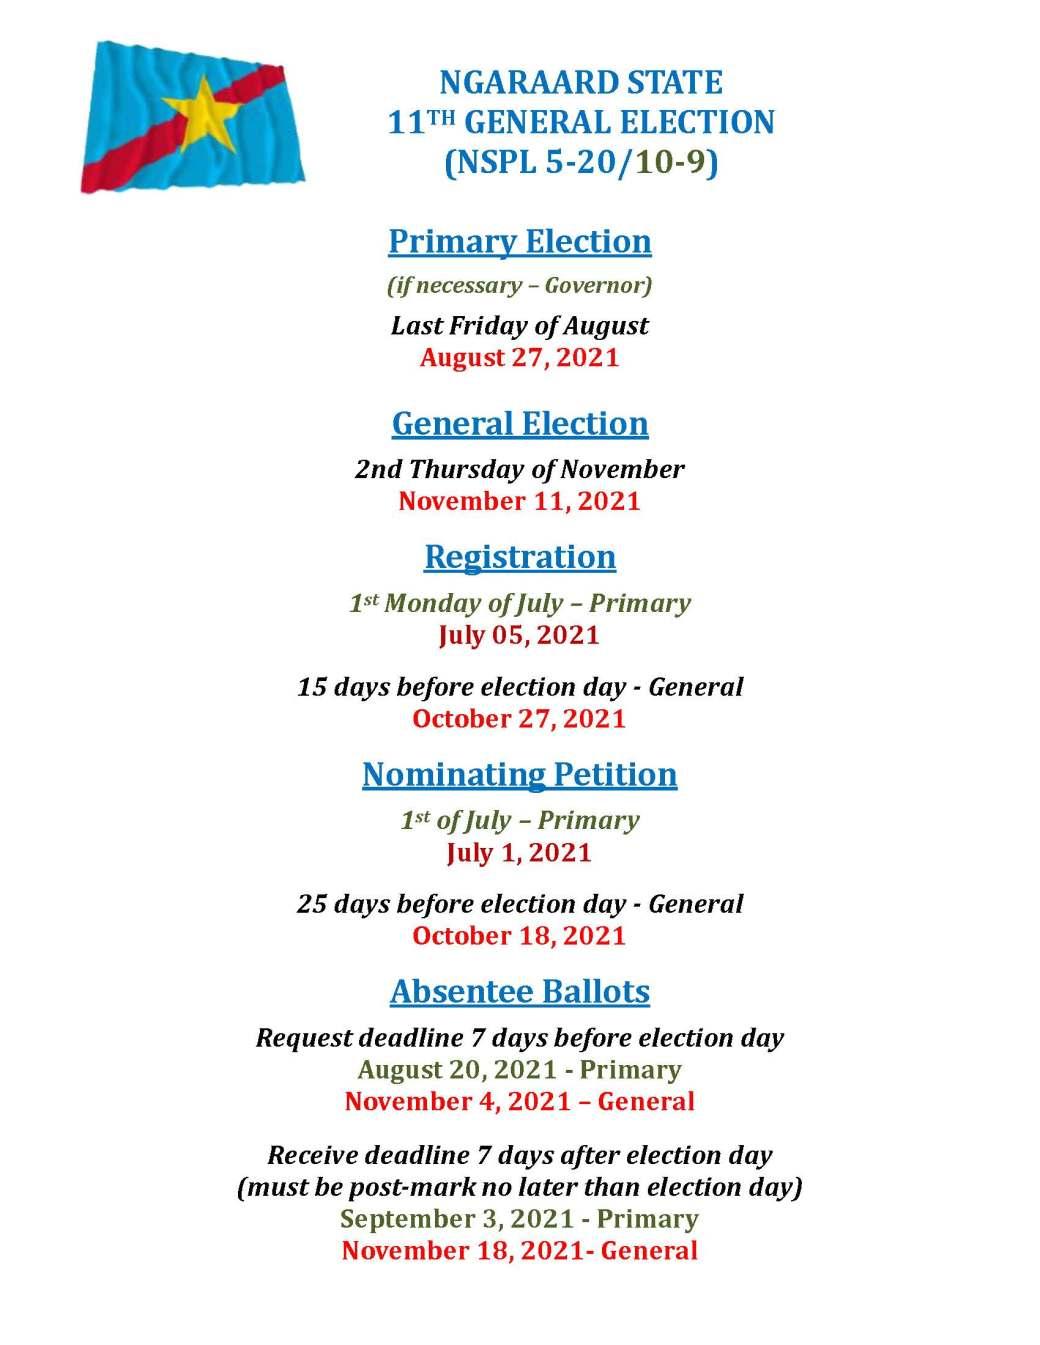 NGARAARD ELECTION DEADLINE DATES